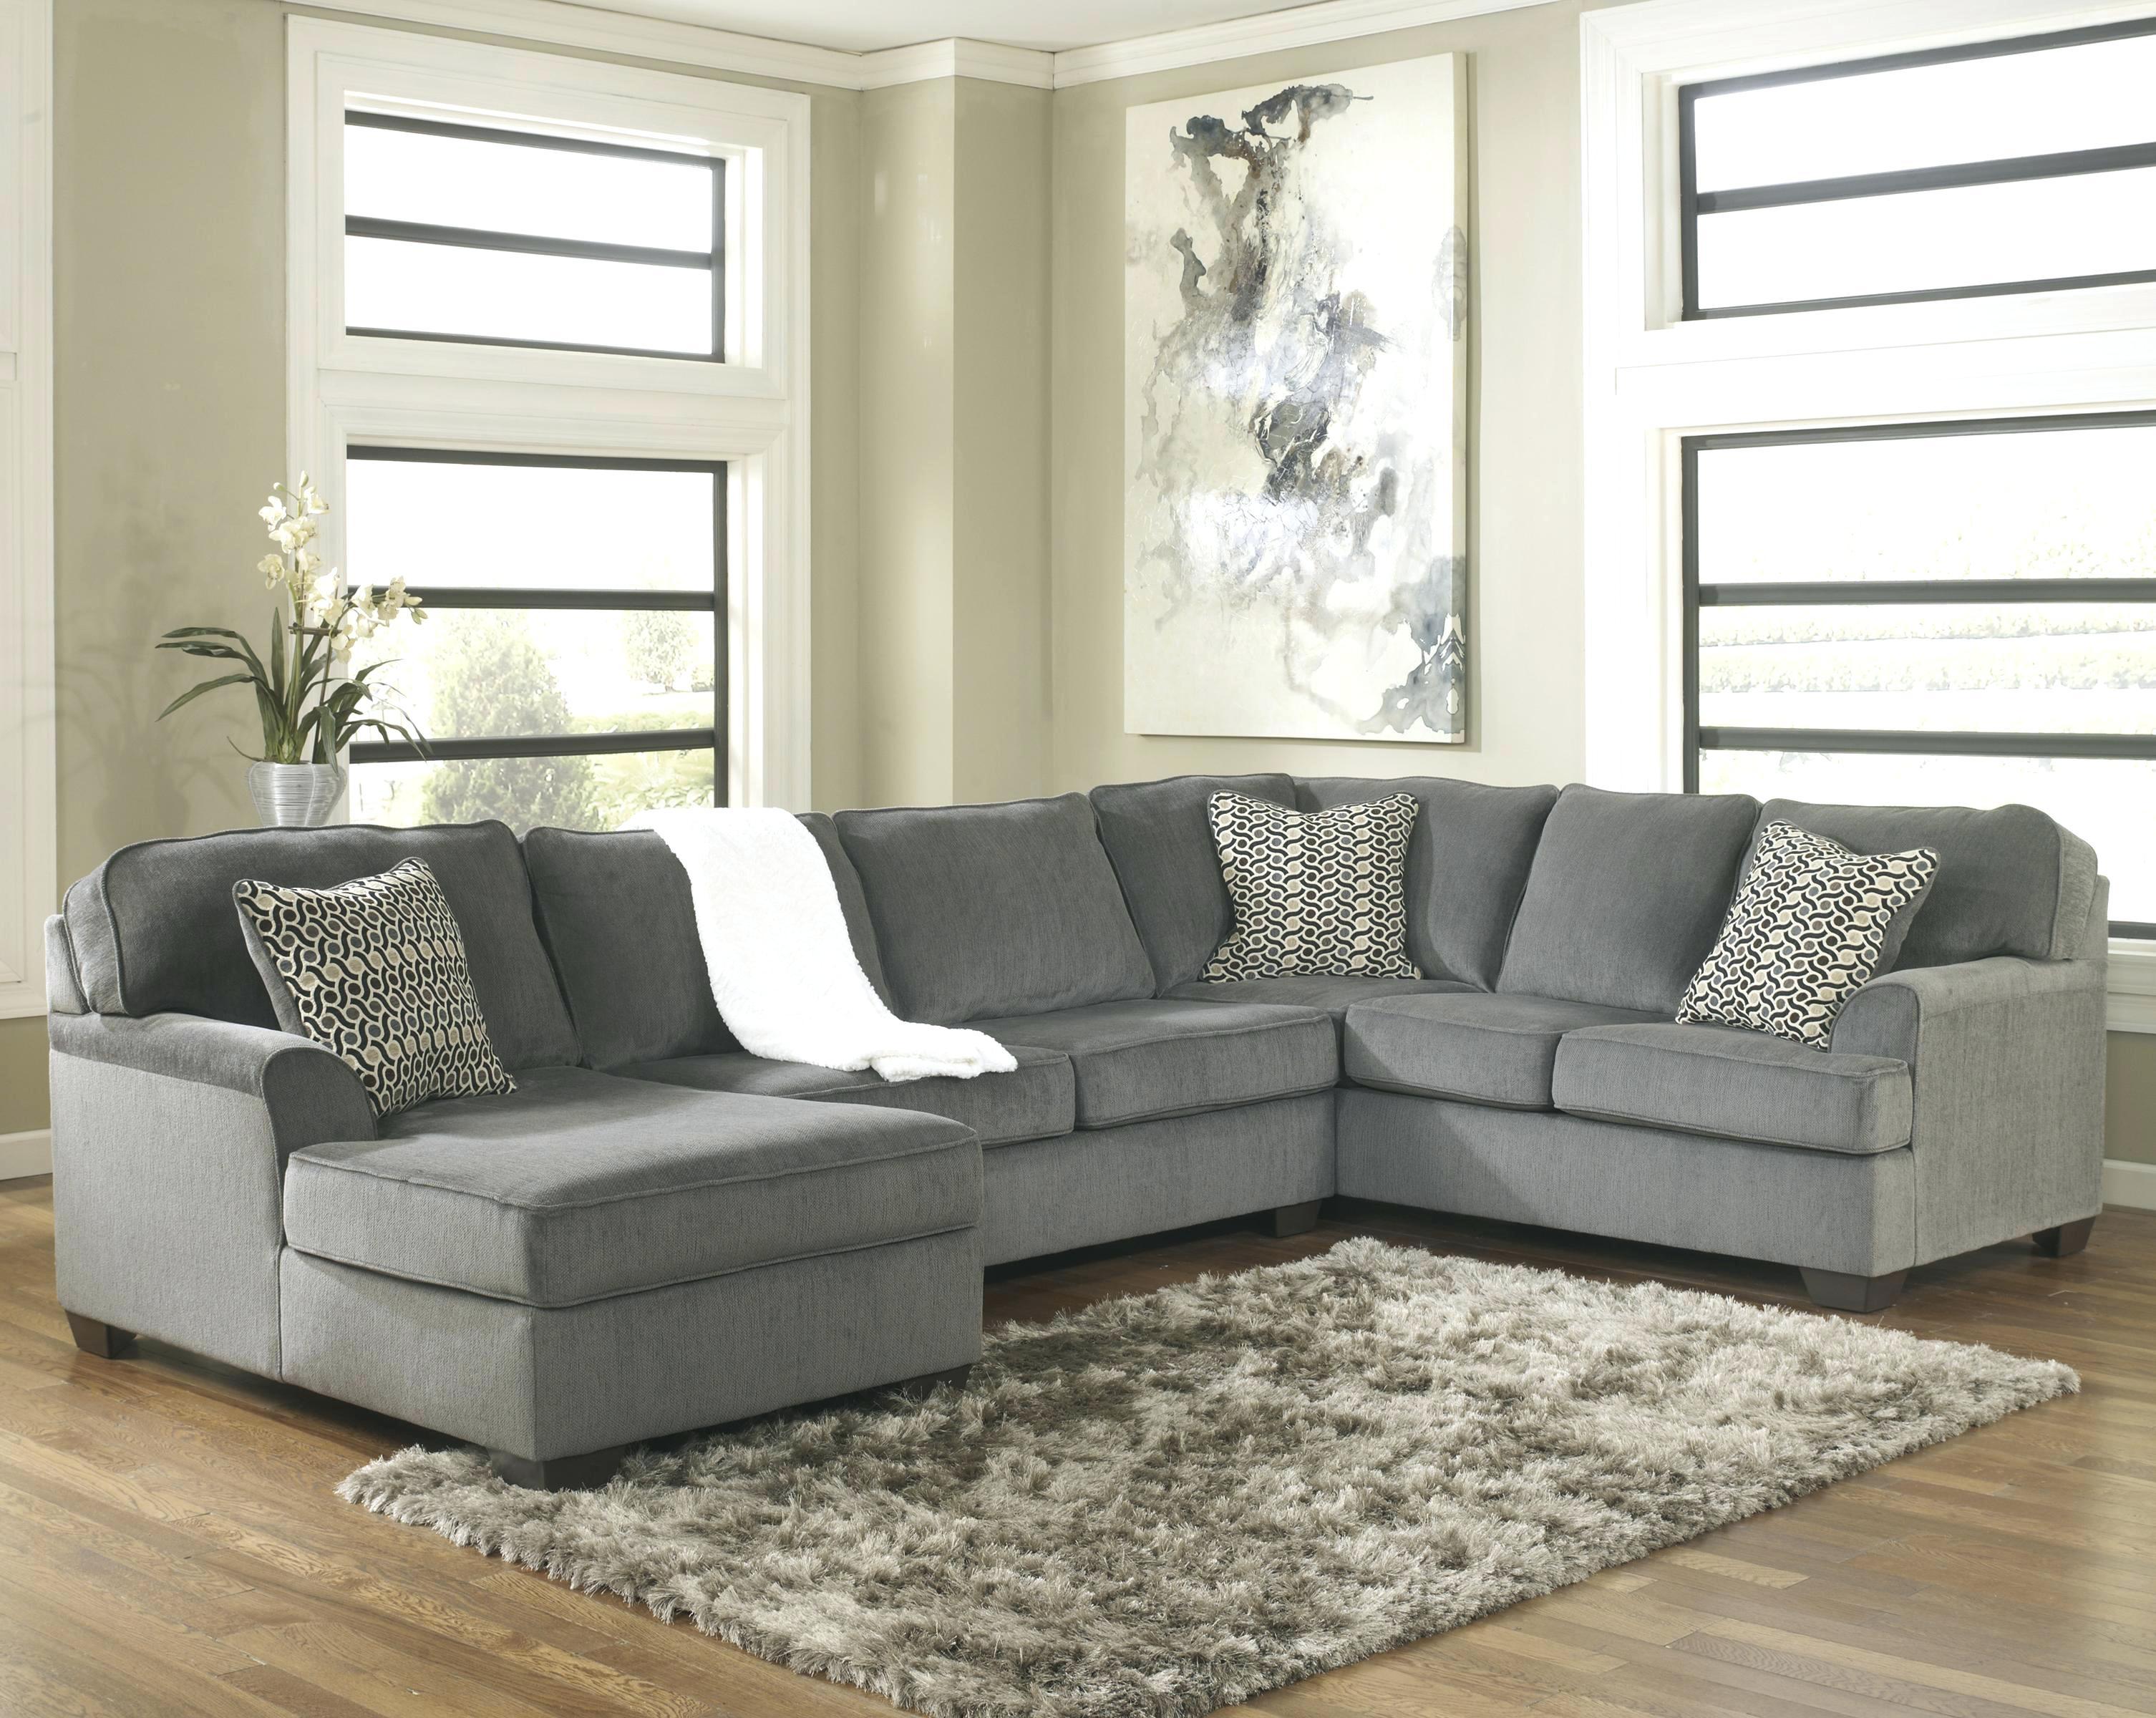 Ashley Furniture Tuscaloosa – Premiojer (View 8 of 10)